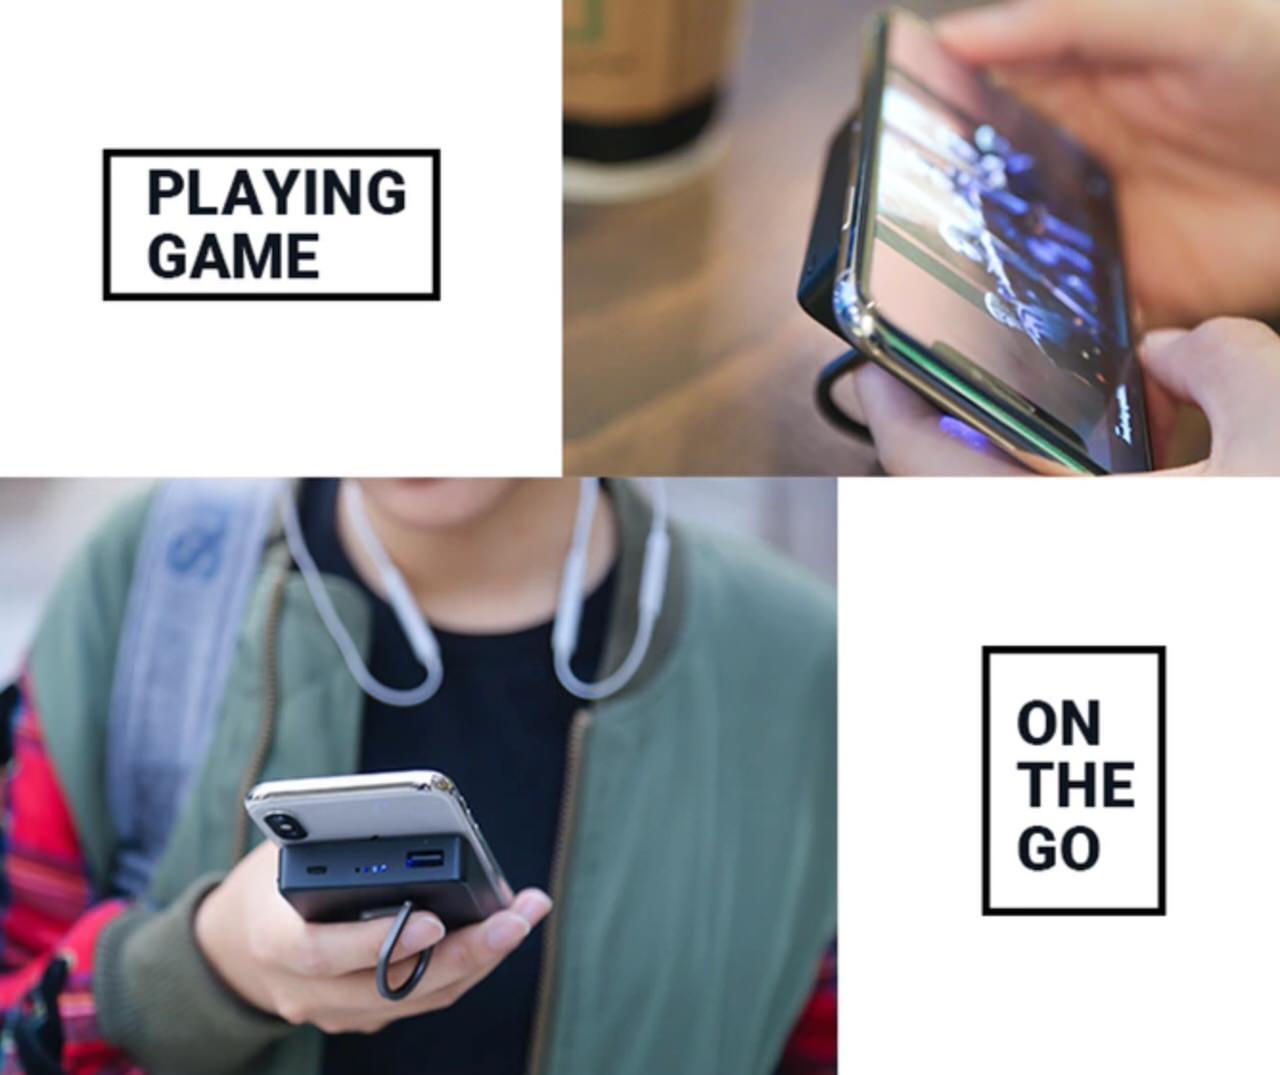 iPhoneに吸い付くワイヤレスのモバイルバッテリー「TinyJuice」